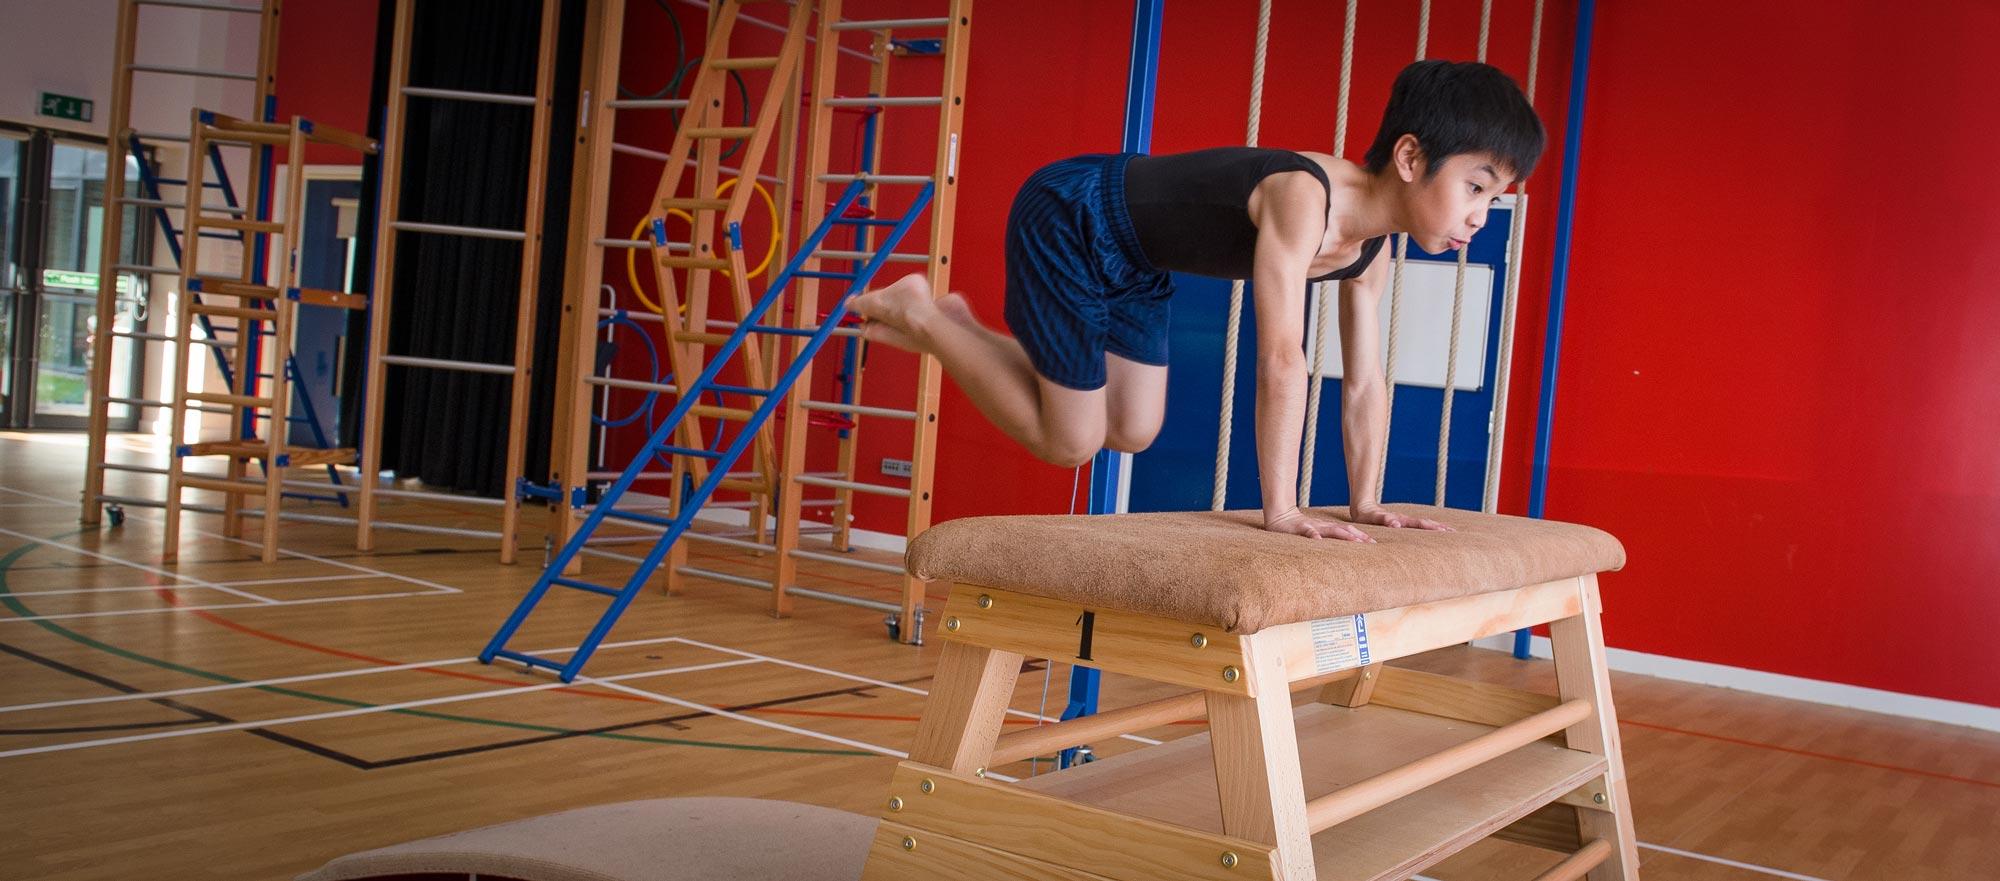 Gymnastic performance at Churchfields Junior